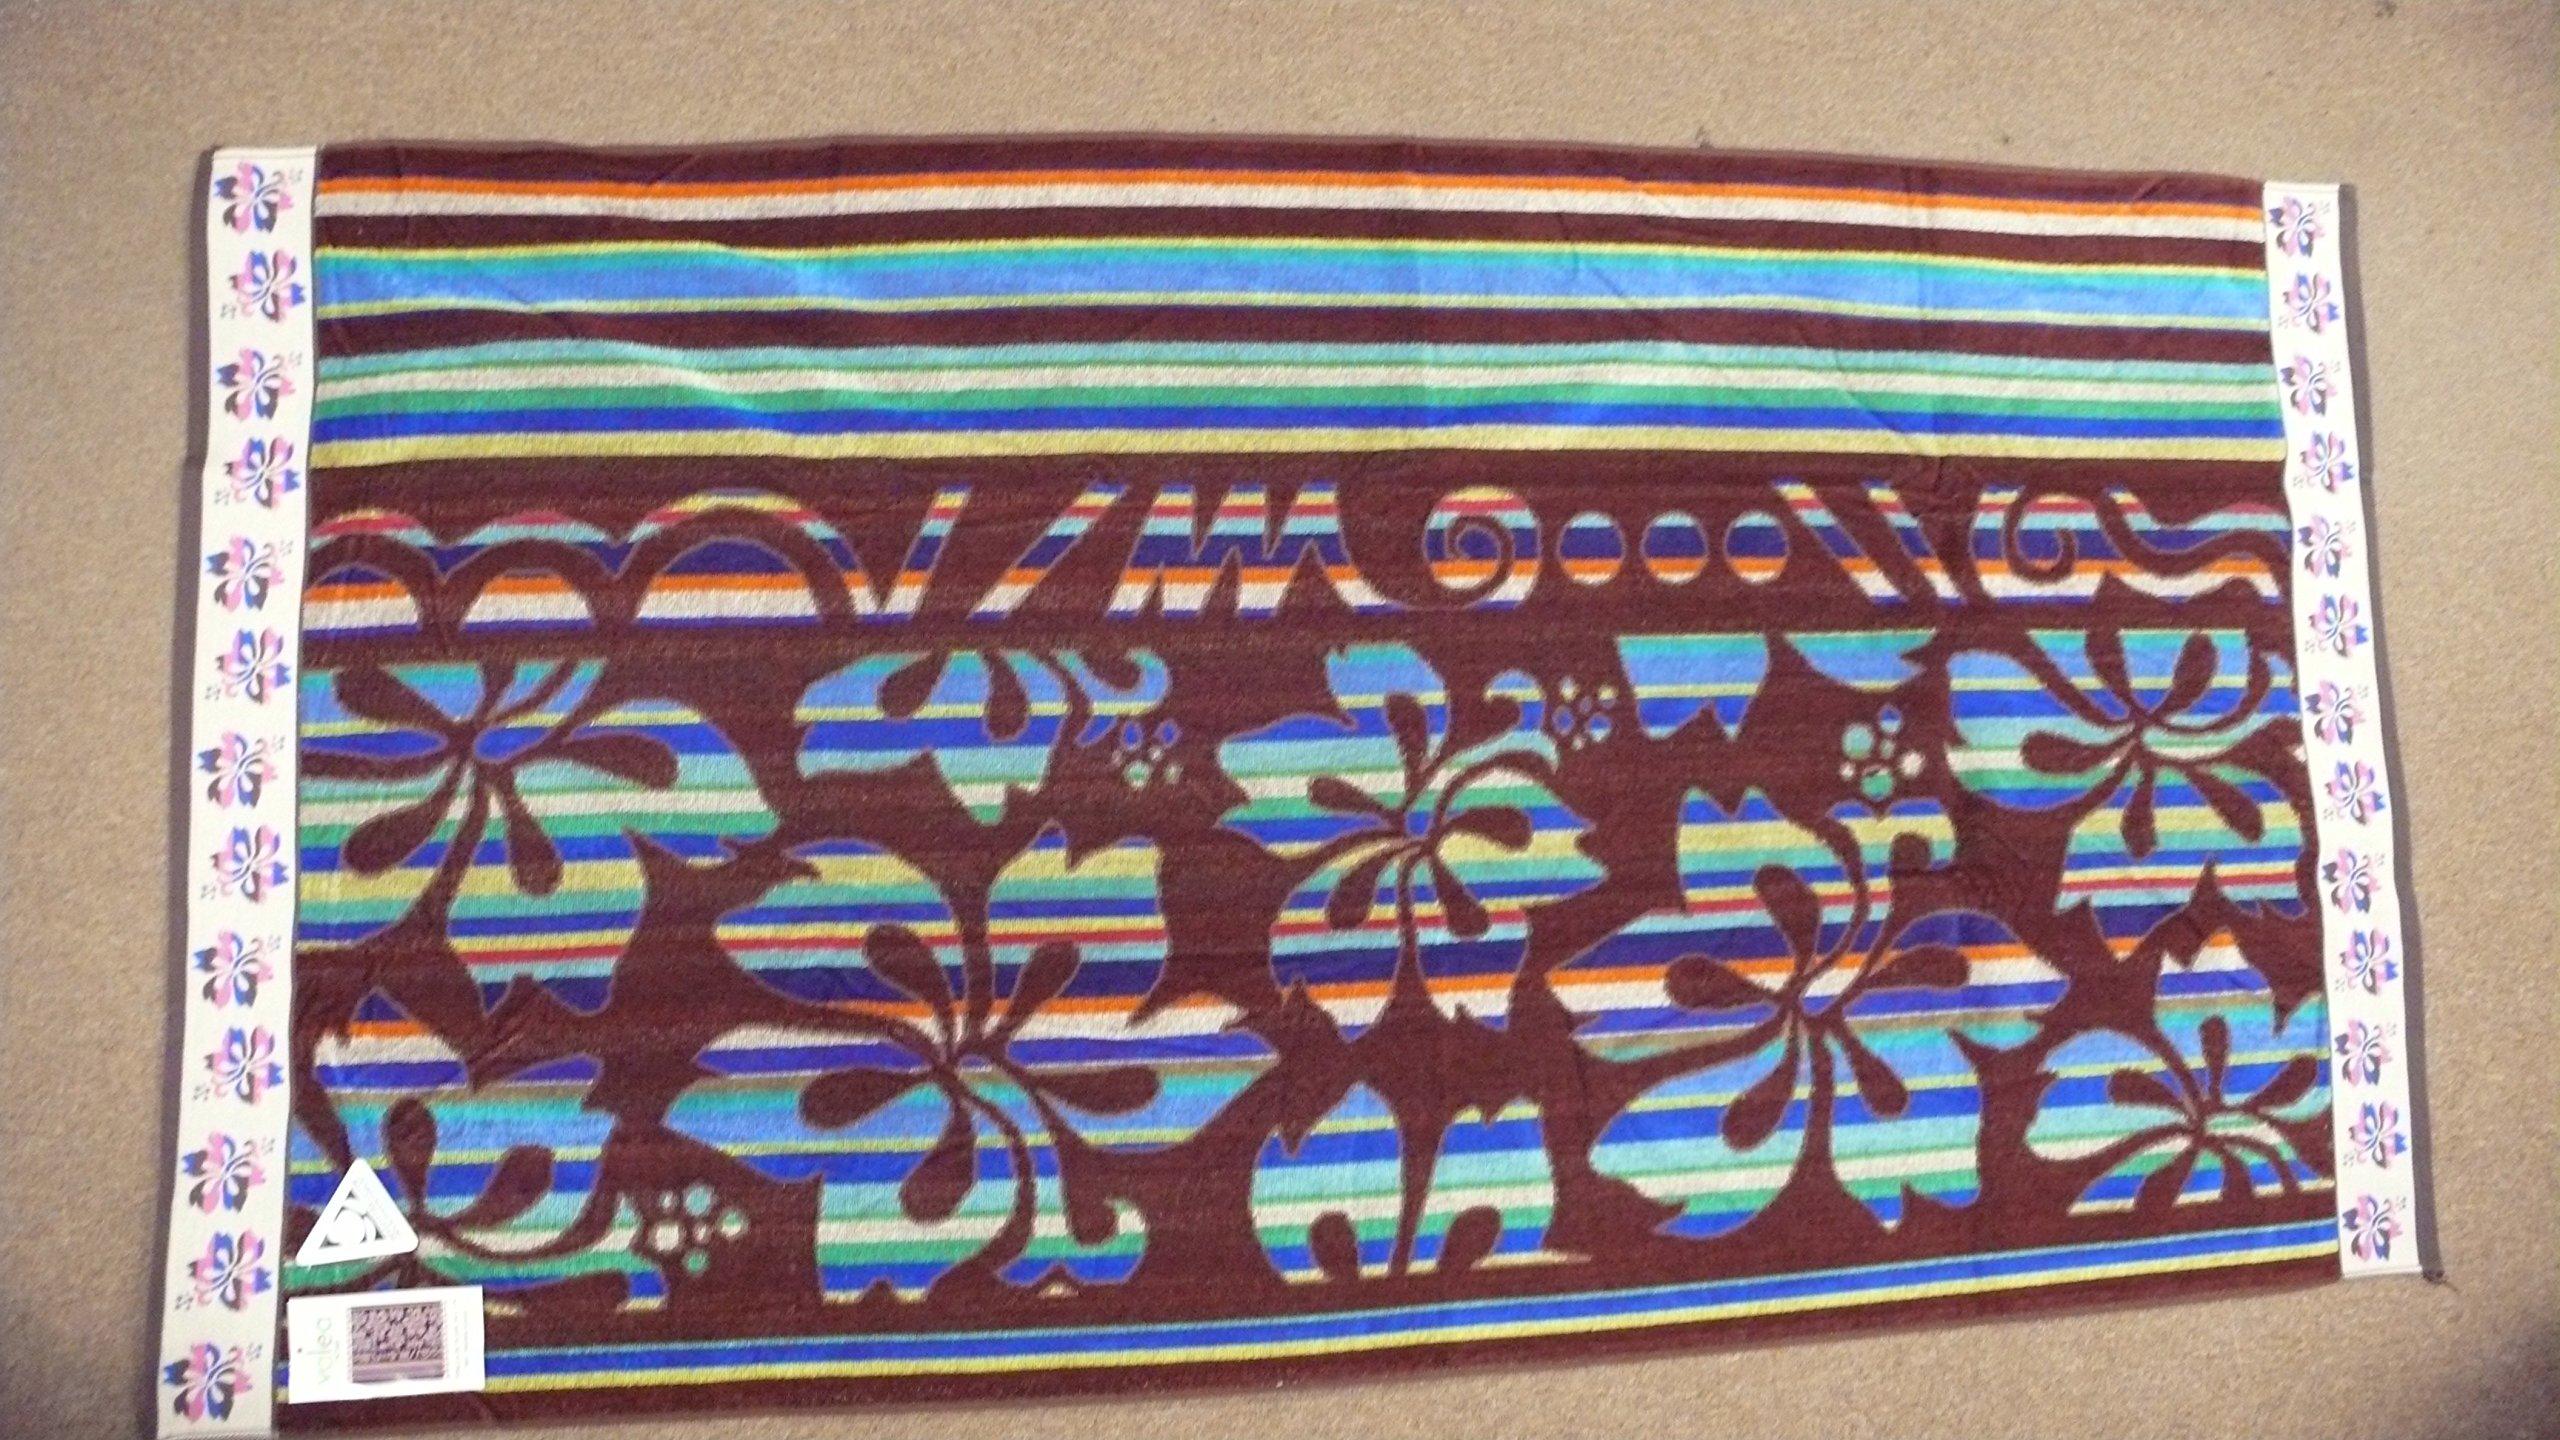 TOALLA PLAYA - PISCINA 100% ALGODON EGIPCIO 95 X 175 CM BROWN ...